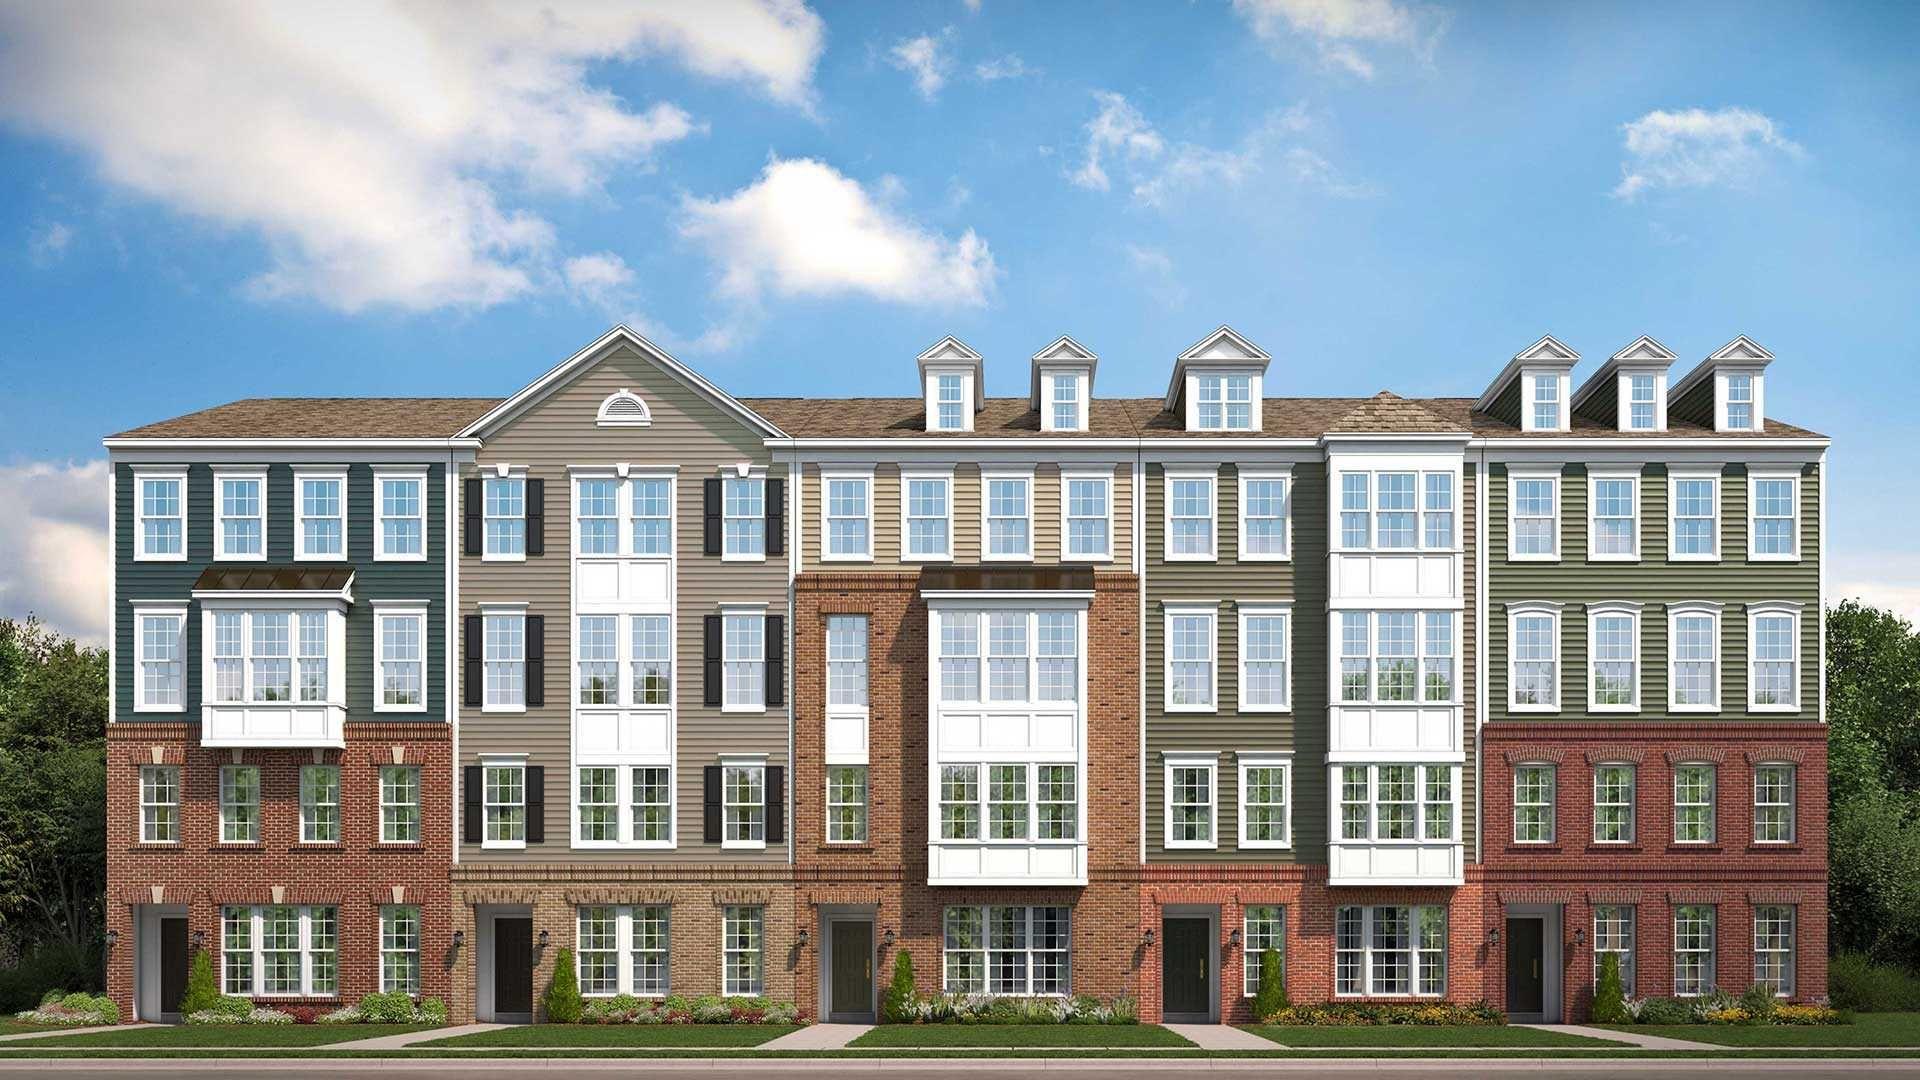 Walton Oaks Apartments Augusta Ga Apartments In 2019